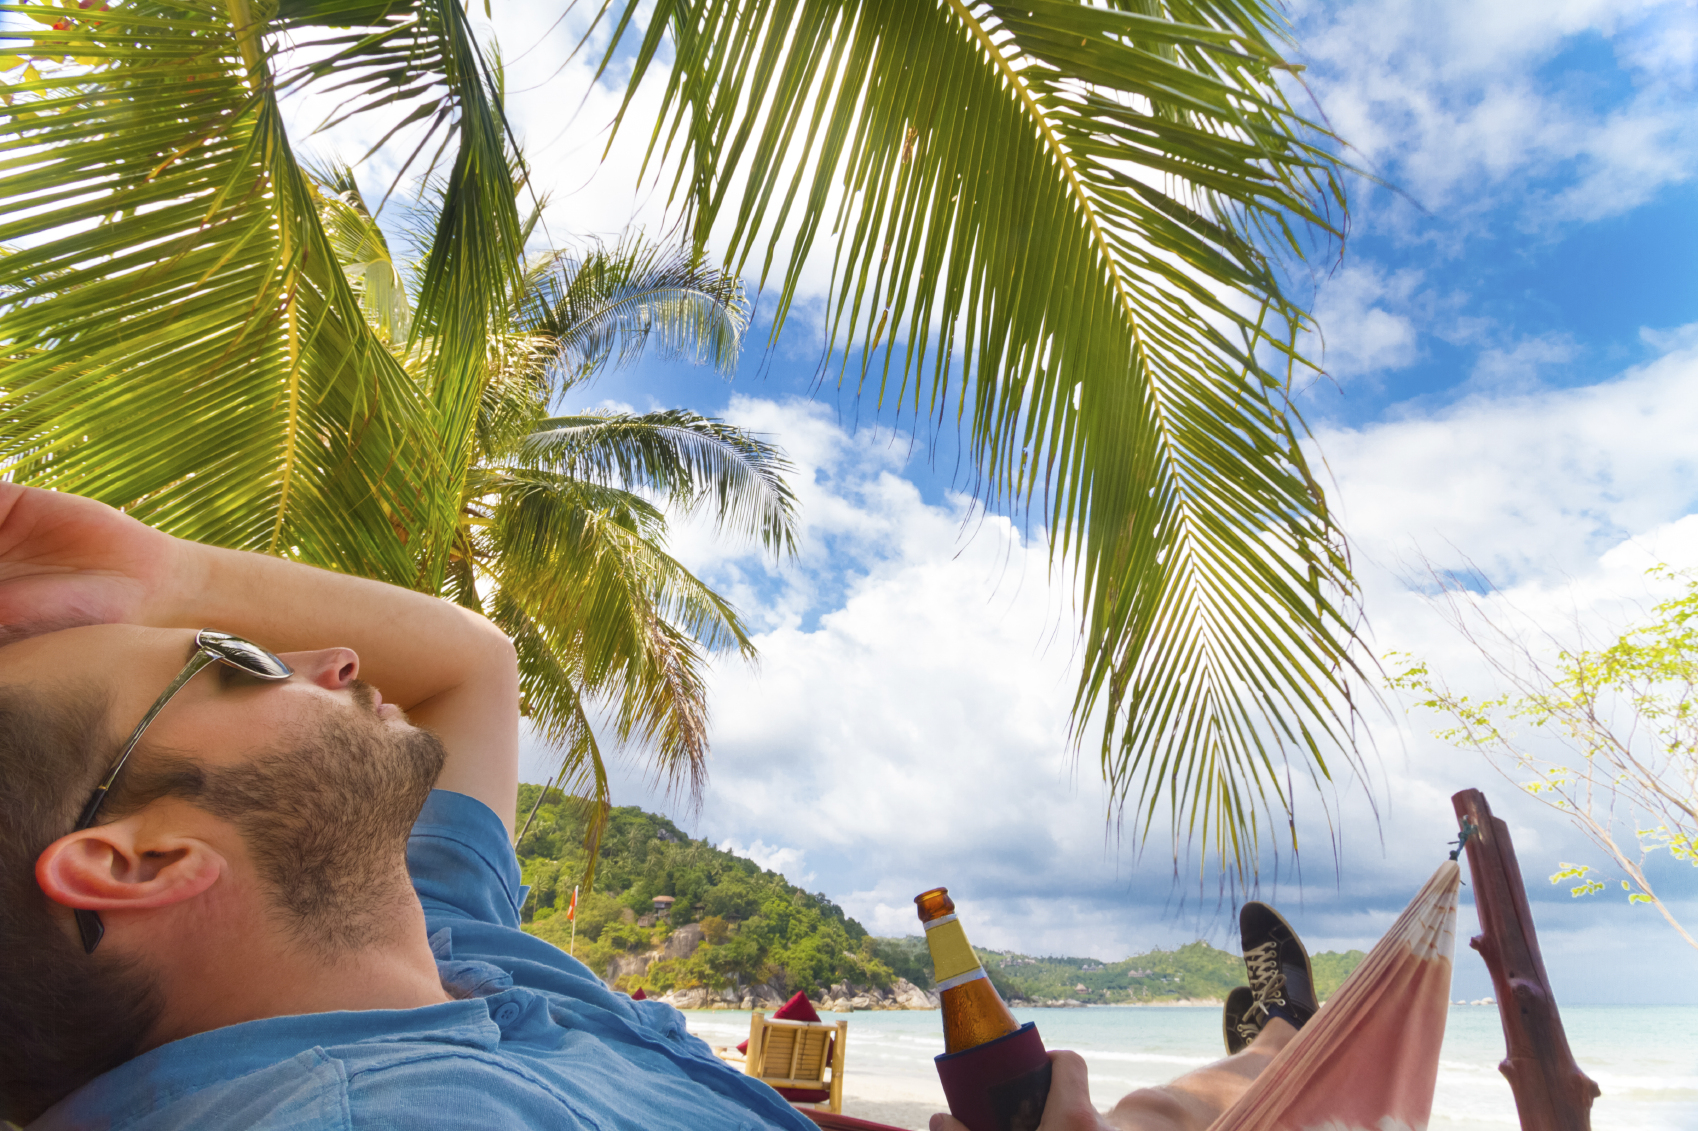 Top 10 International Travel Destinations For Single Men